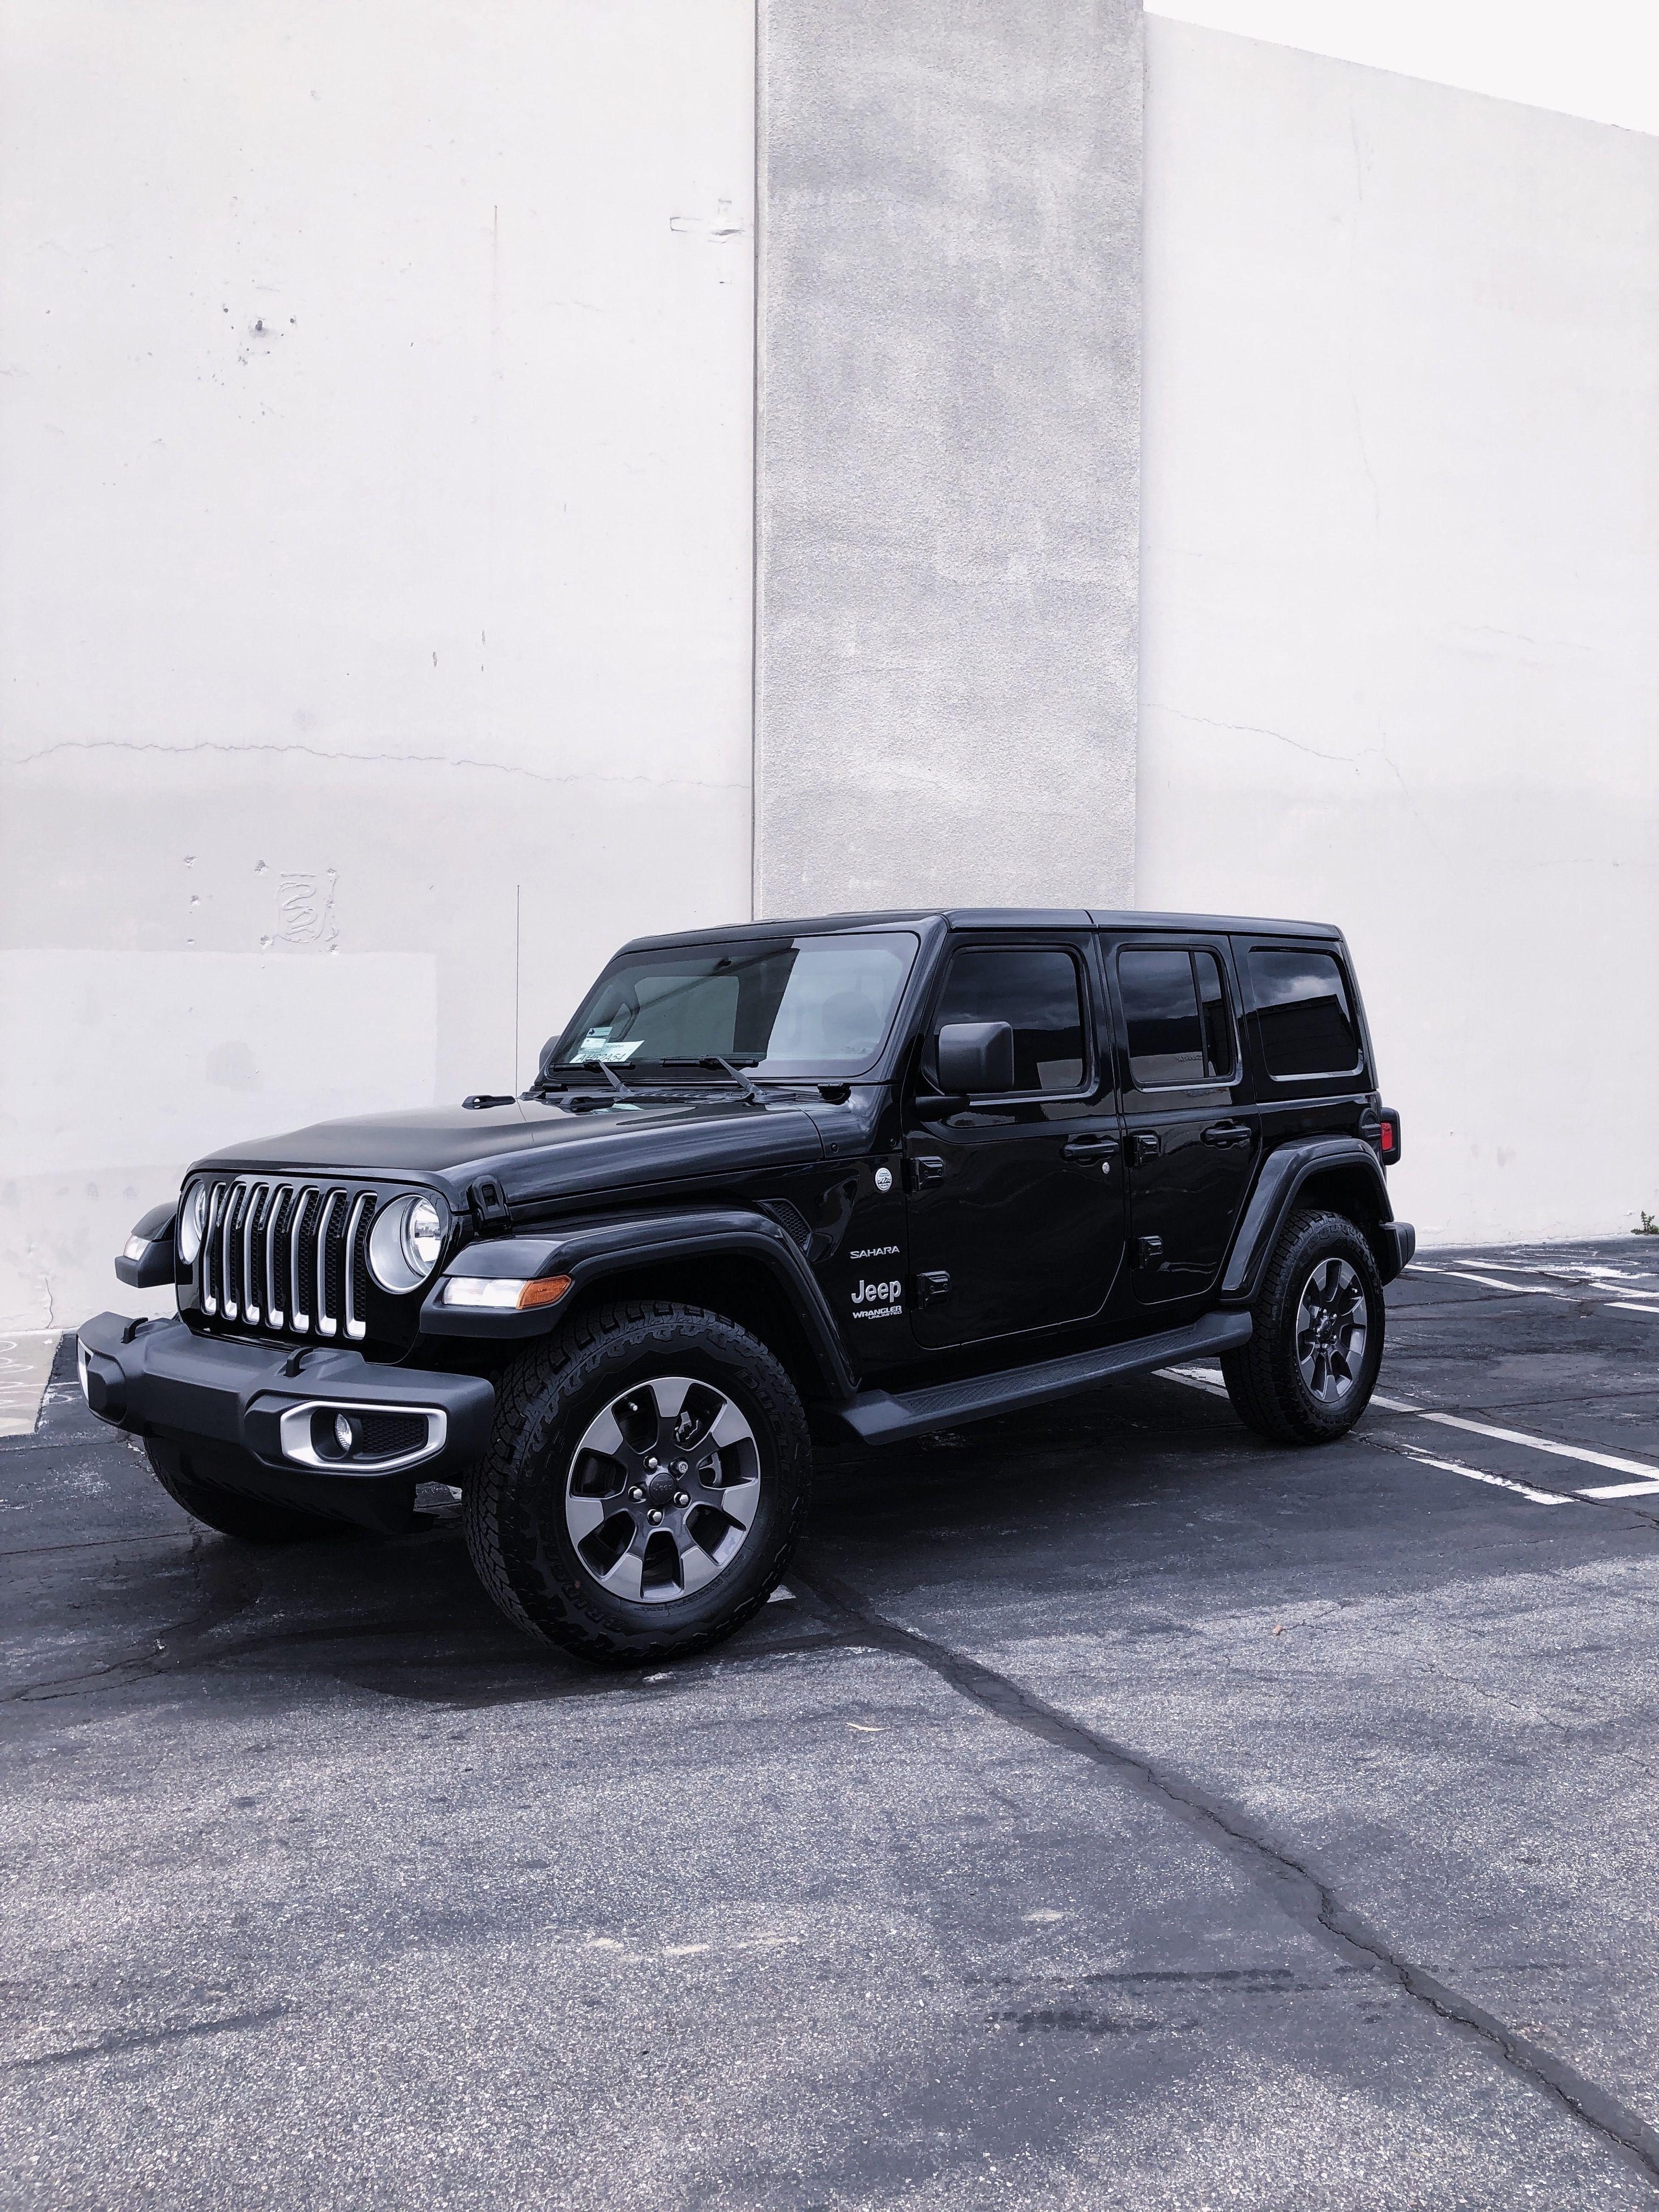 Black Jeep Wrangler Jl Sahara Cars Black Jeep Wrangler Jeep Dreamland In 2020 Wrangler Jeep Jeep Wrangler Schwarzer Jeep